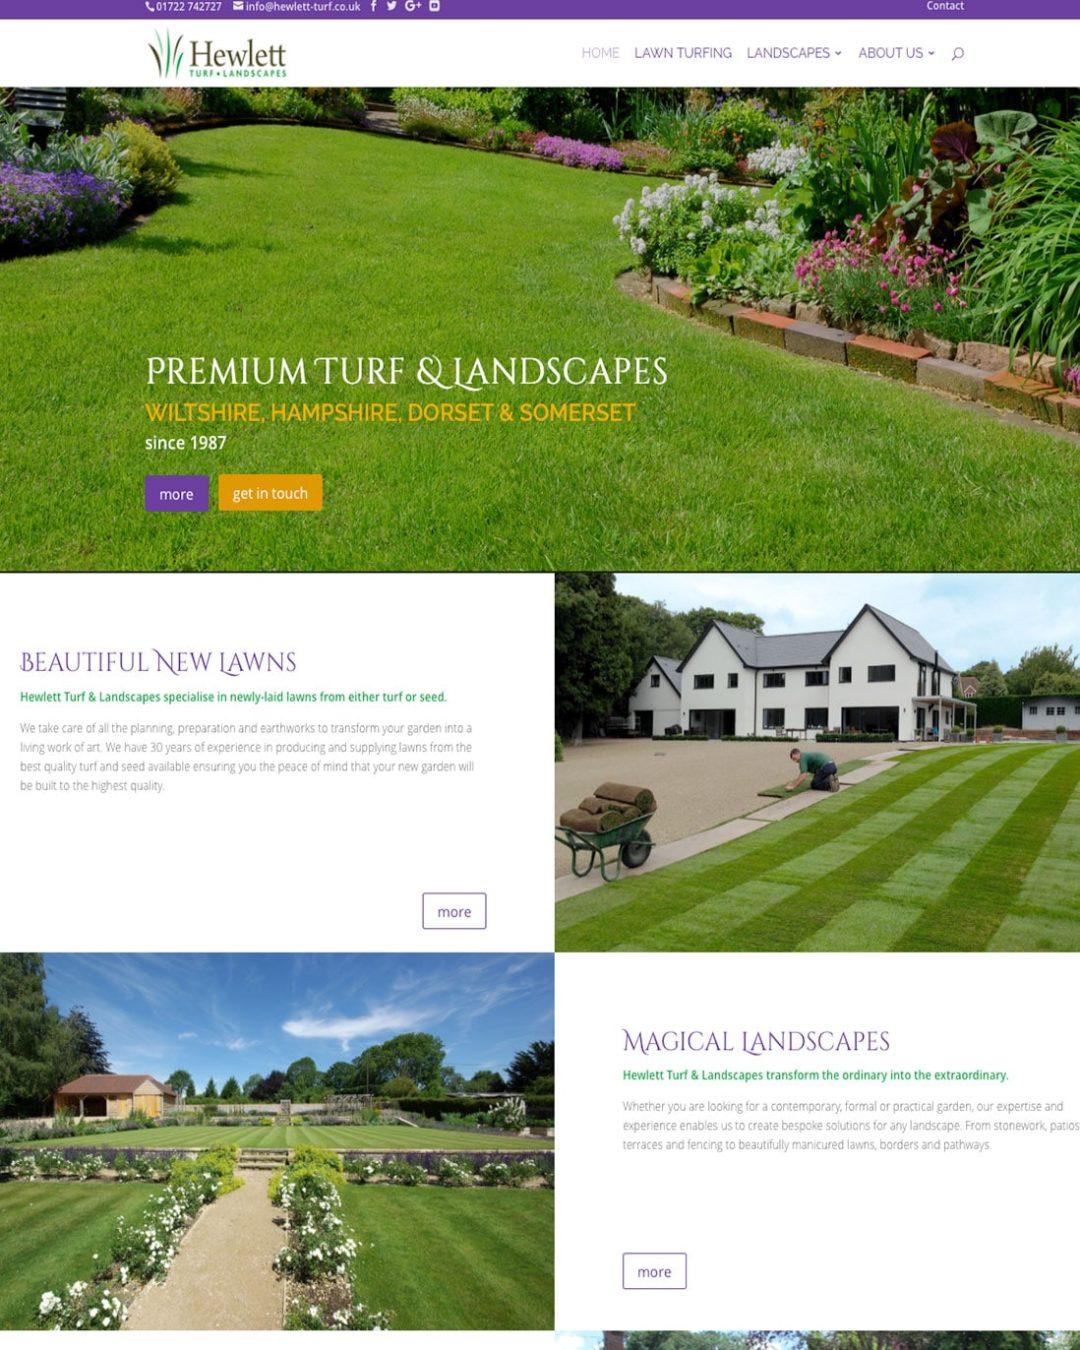 Hewlett Turf & Landscapes